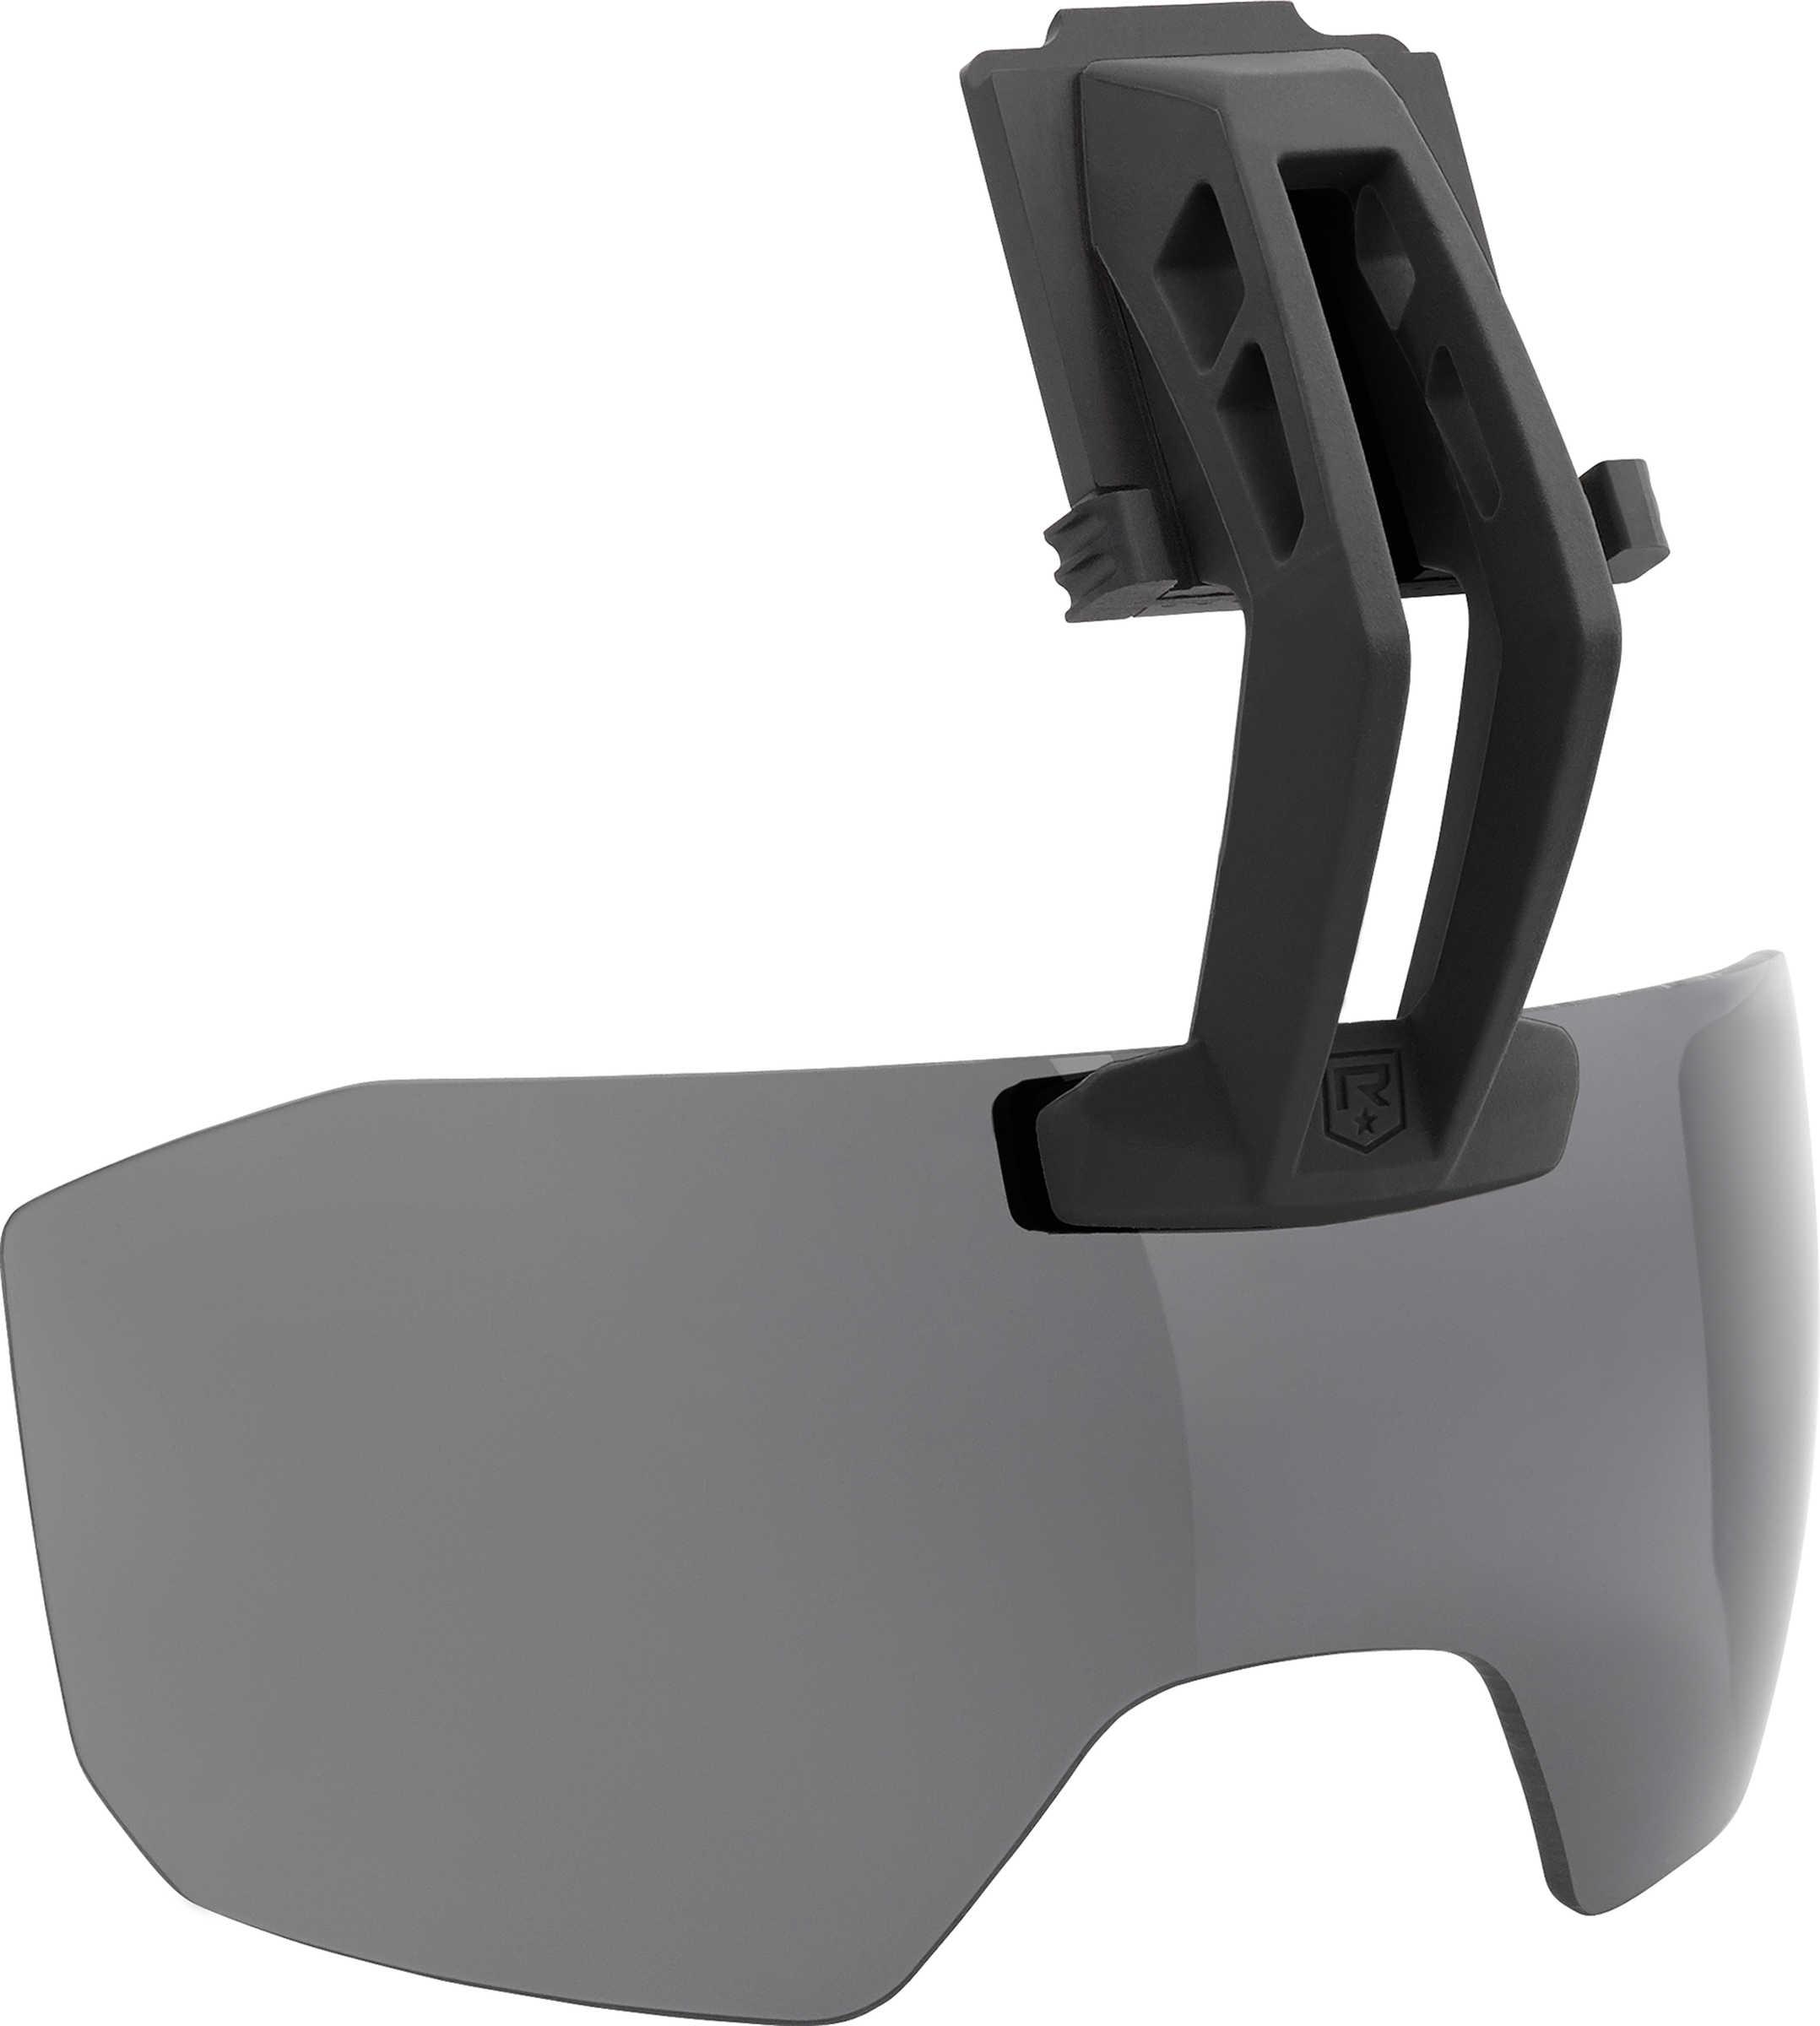 Caiman Visor System   Fixed Arm Smoke Lens